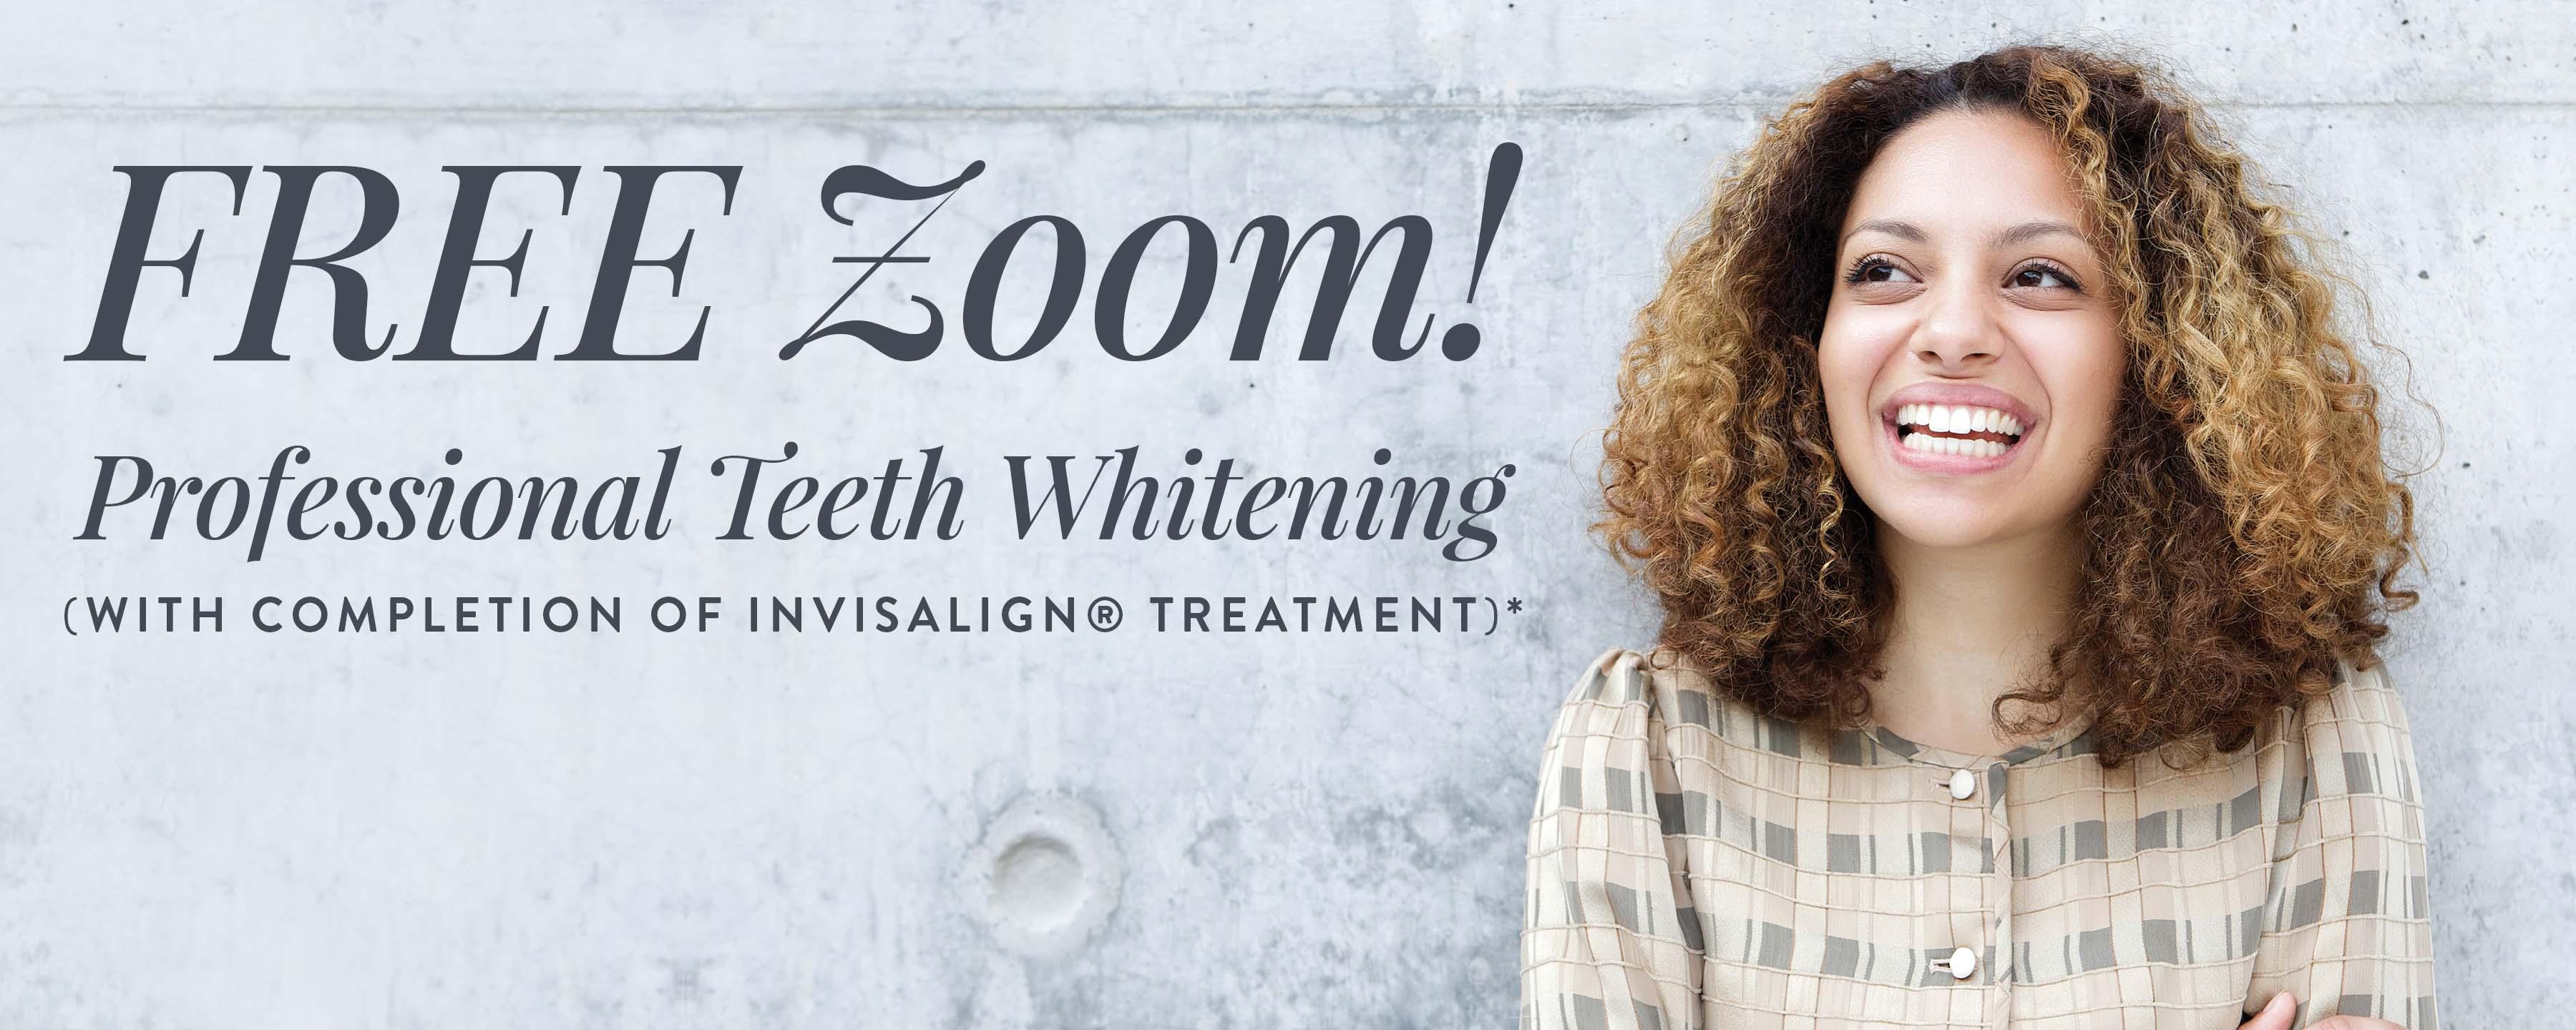 FREE Zoom! Professional Teeth Whitening*